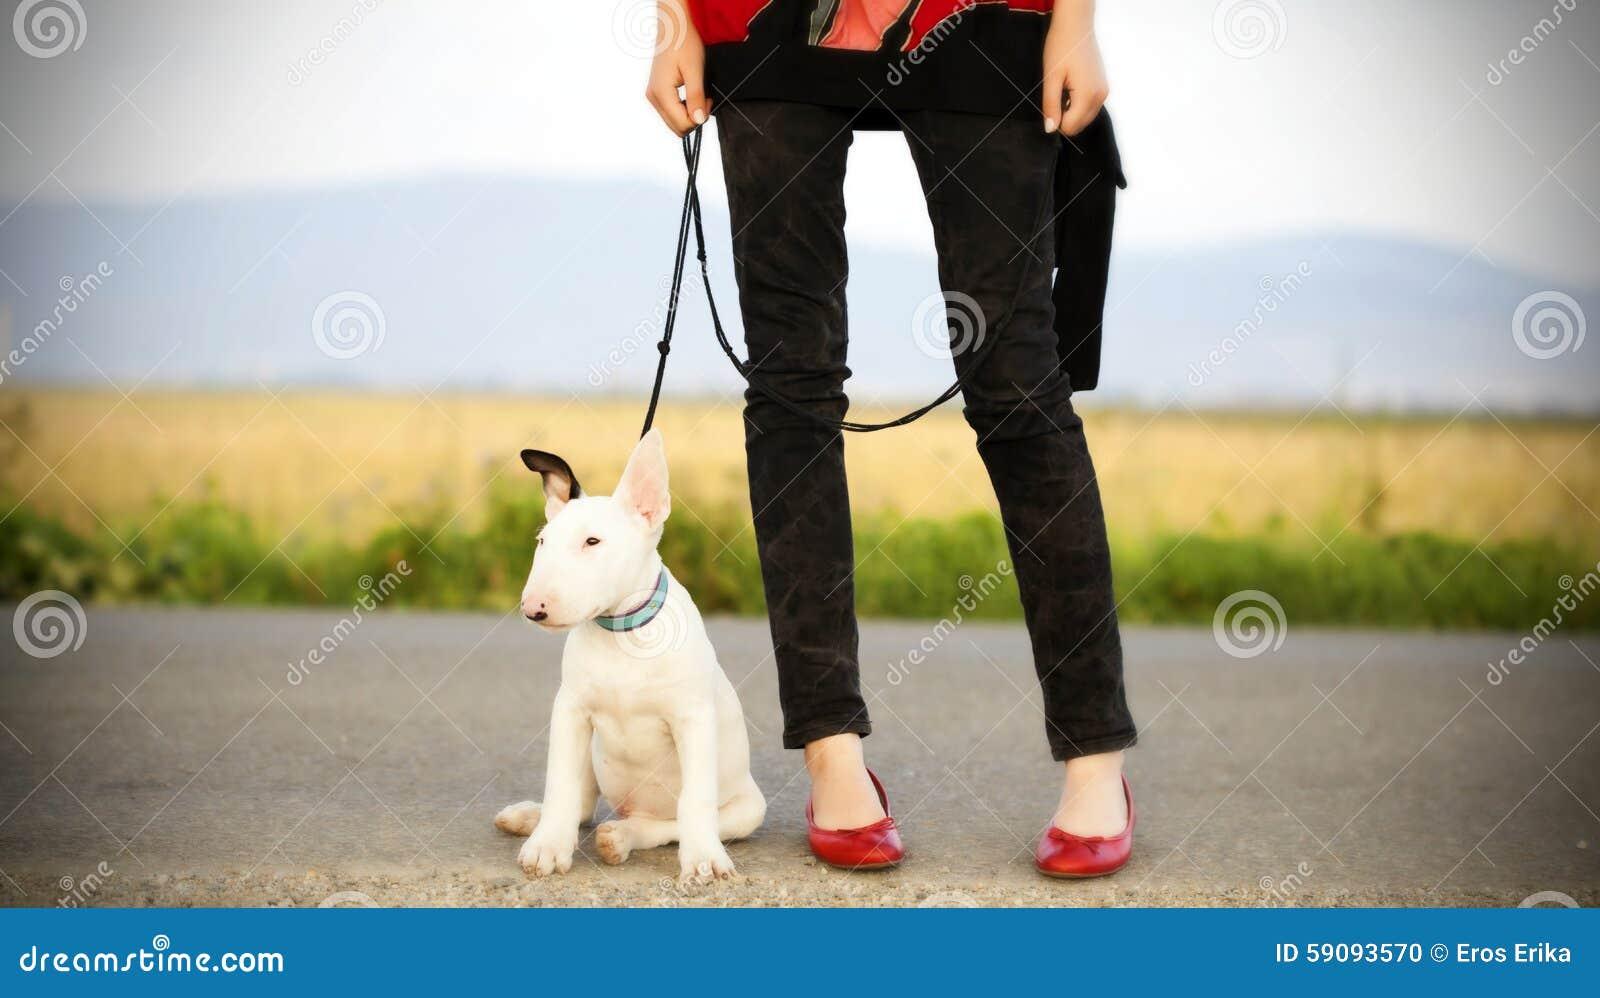 razvedennie-nogi-zhenshin-foto